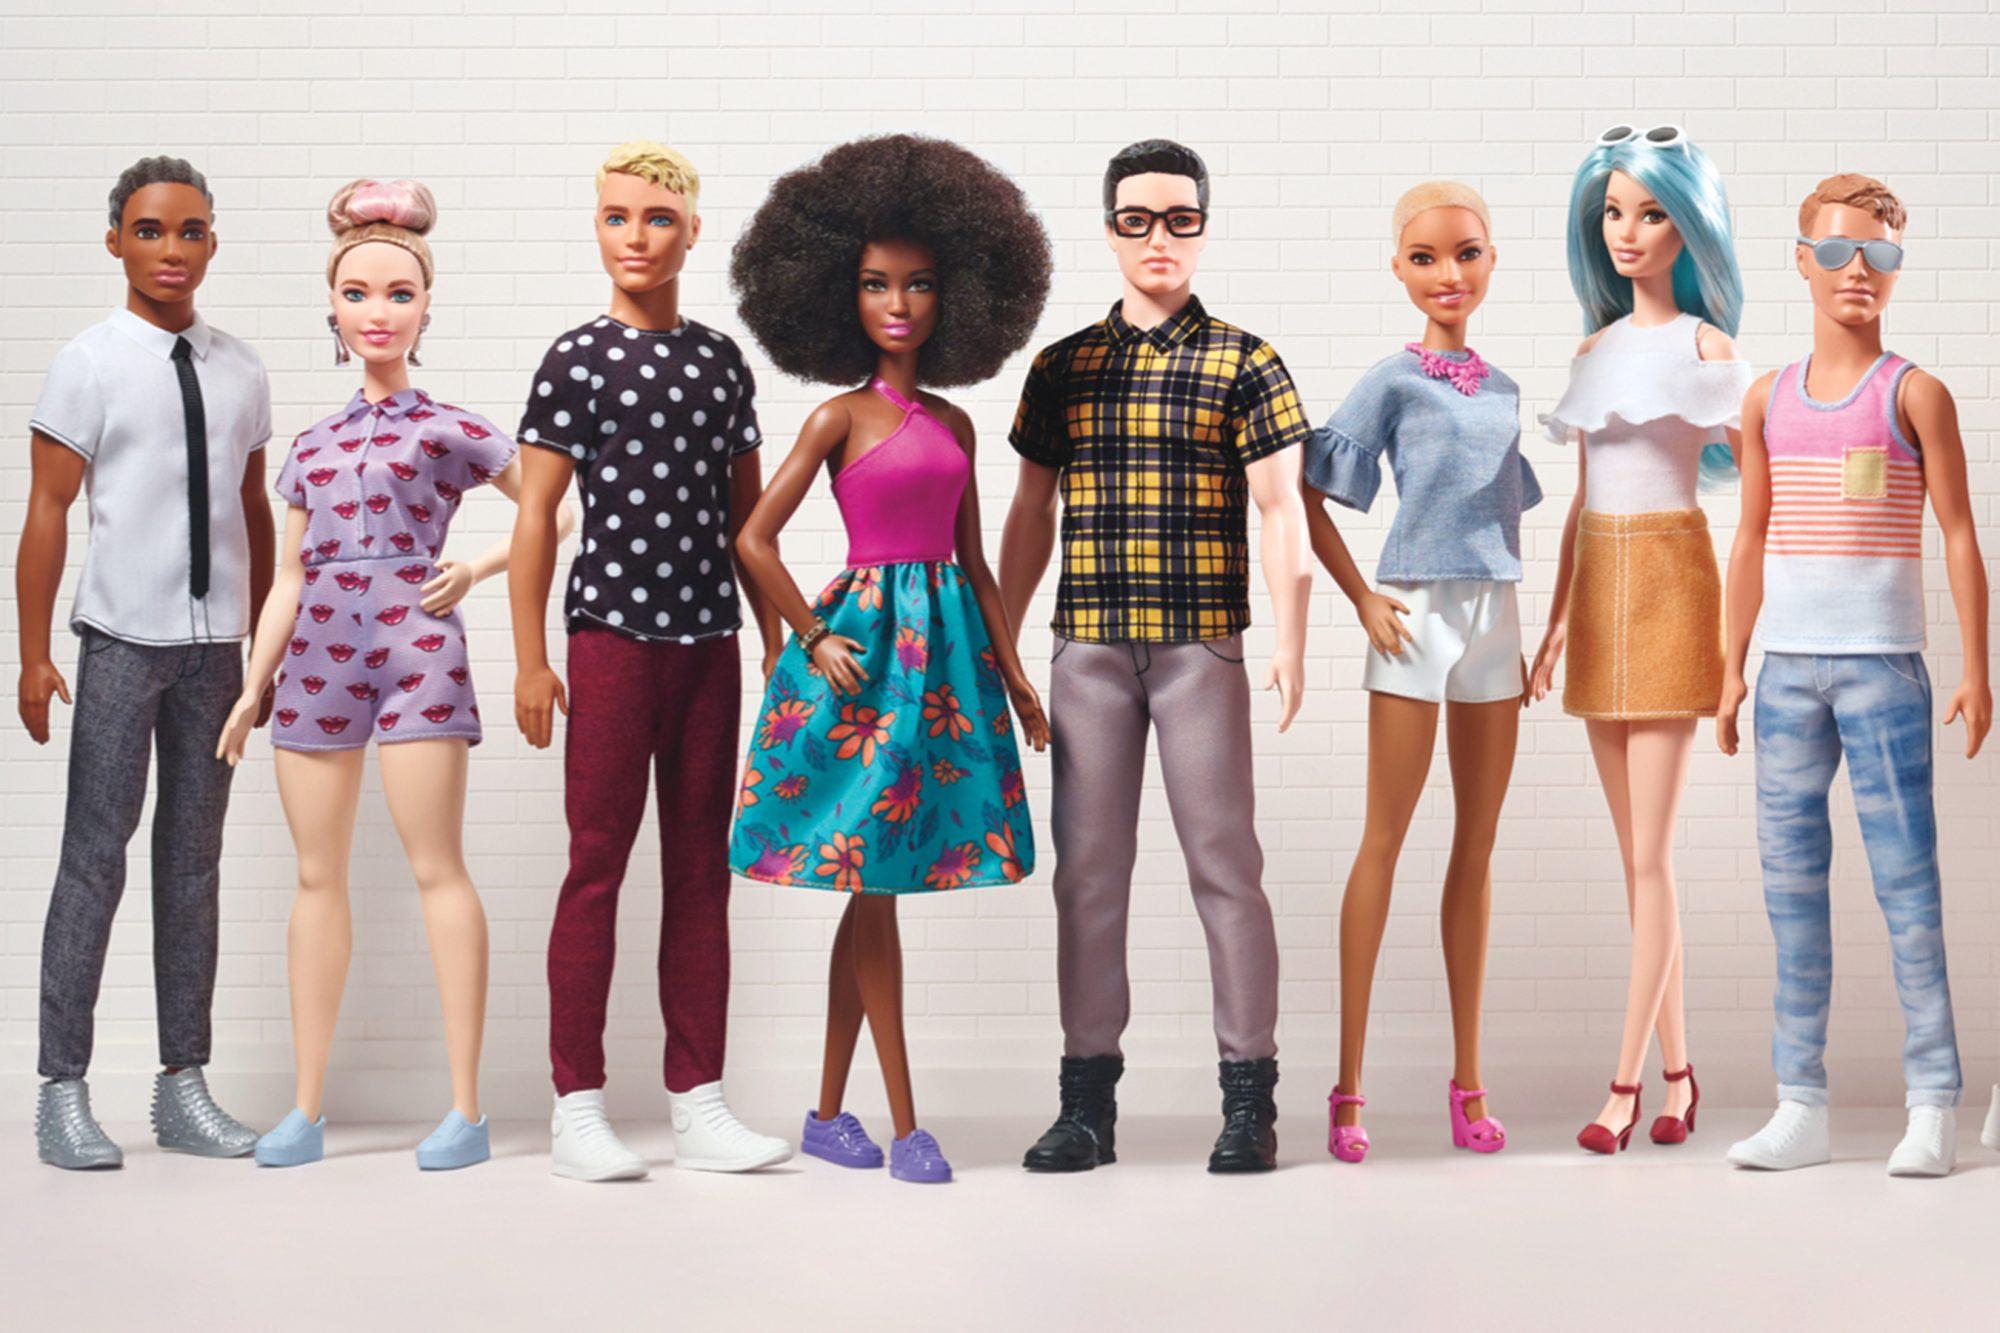 Barbie - Fashionistas Dolls